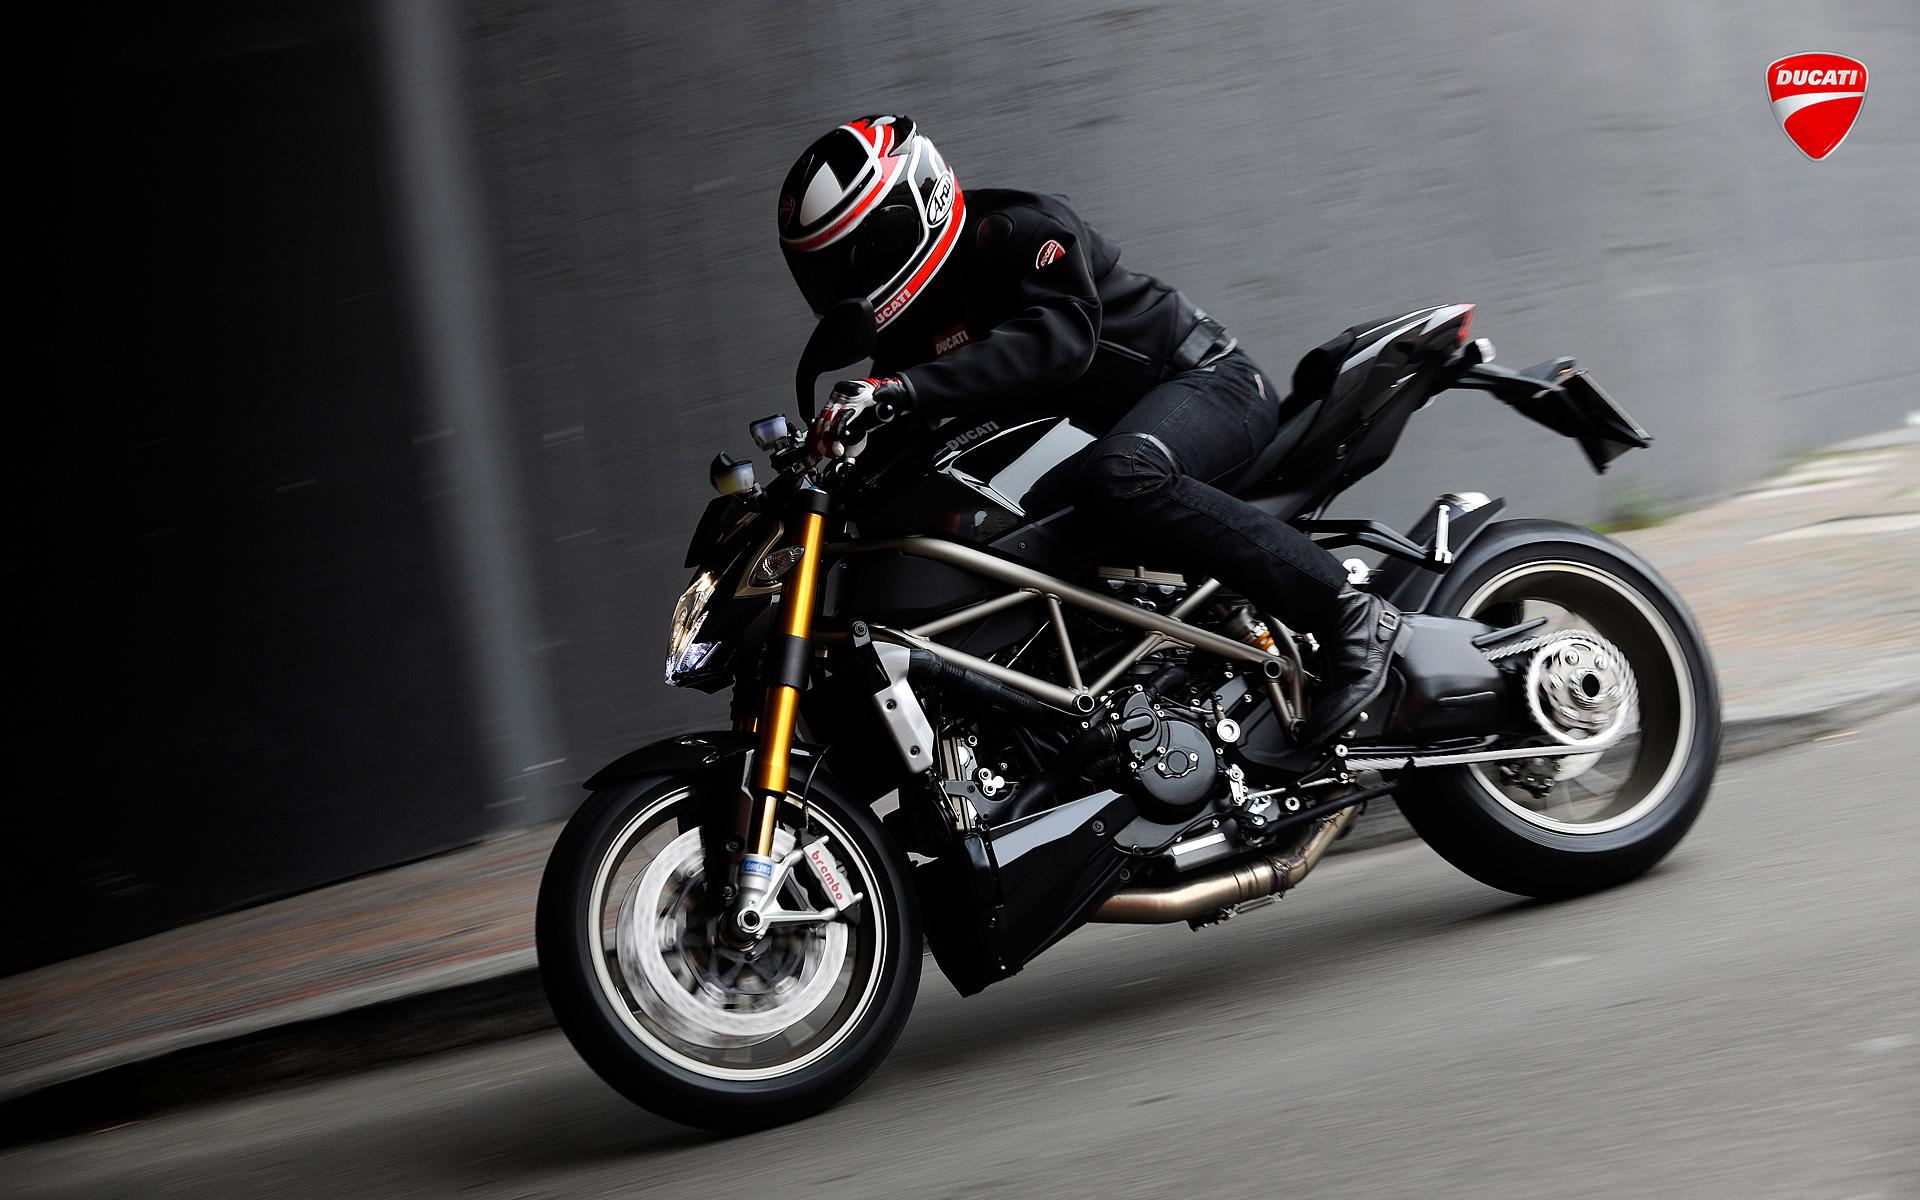 Wallpapers De Motos Fondos De Motos: Ducati Wallpapers, Pictures, Images